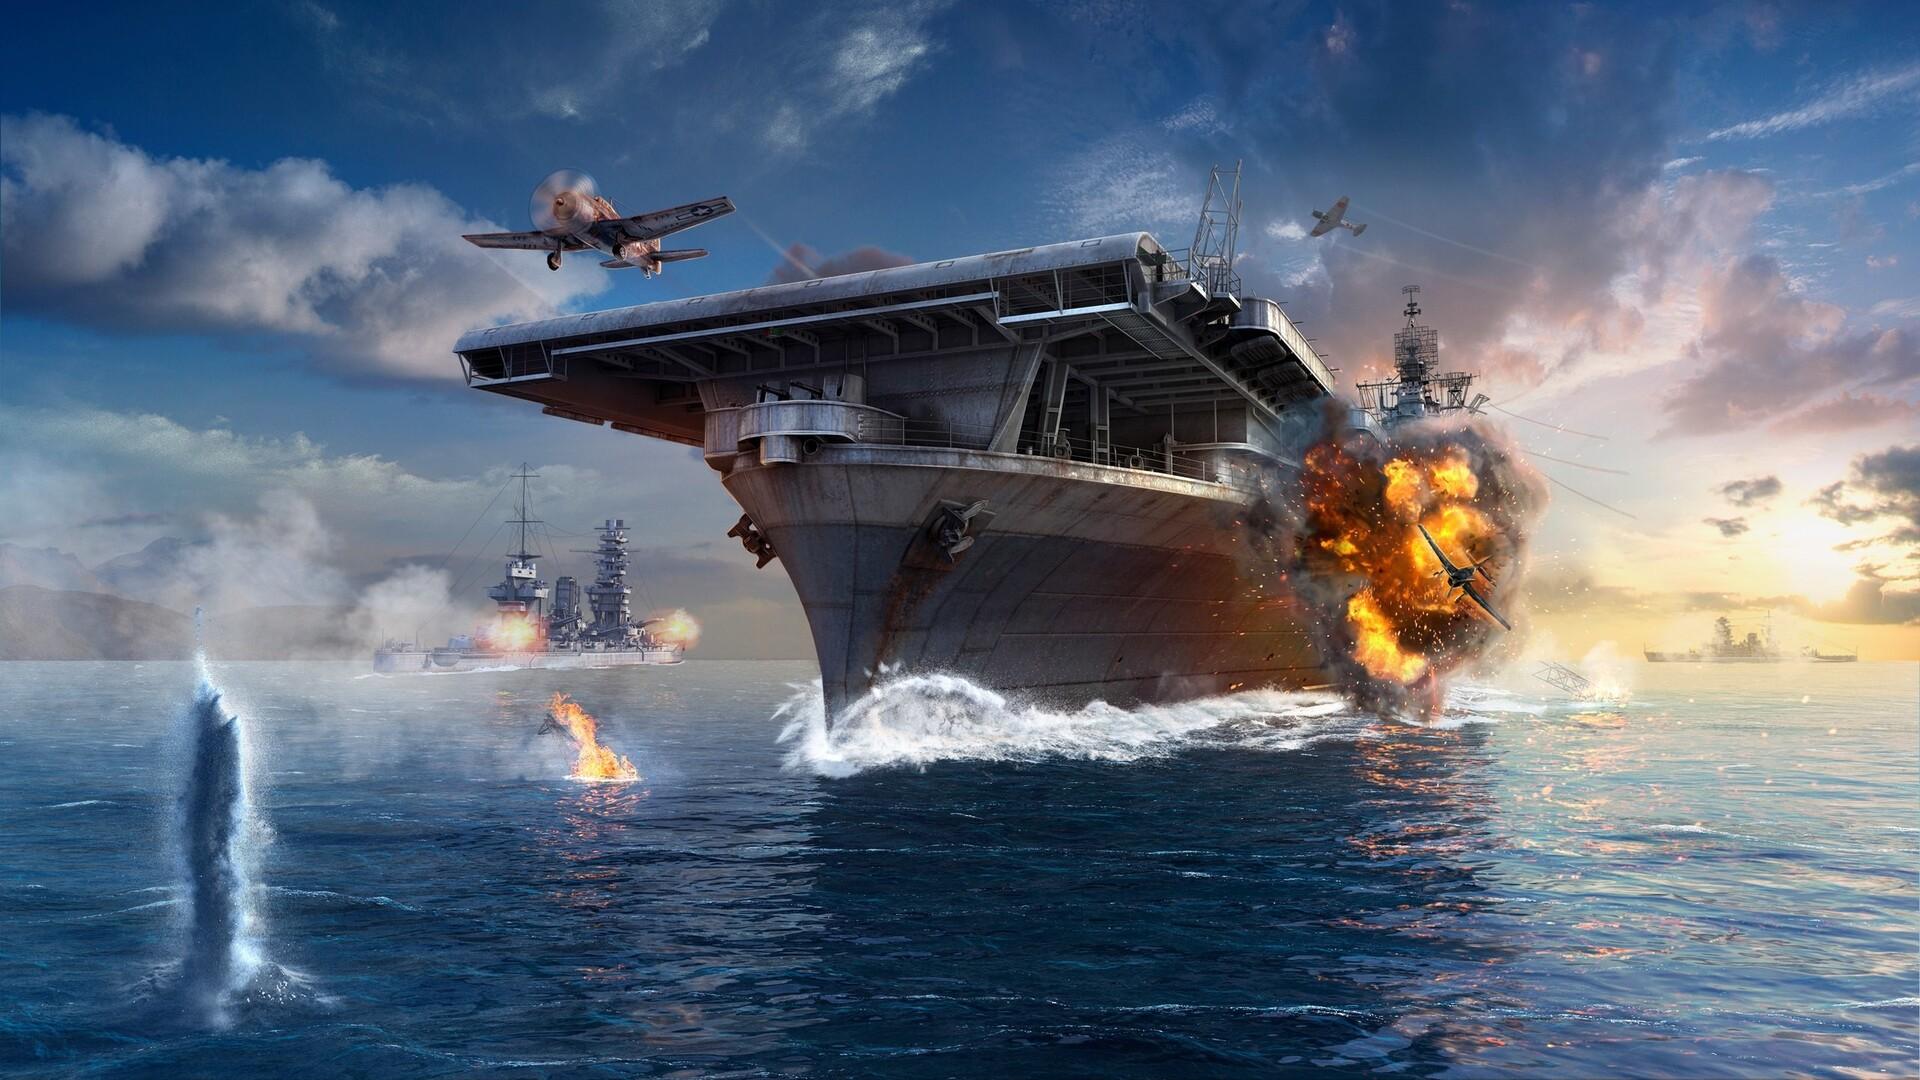 1920x1080 World Of Warships 2 Laptop Full Hd 1080p Hd 4k